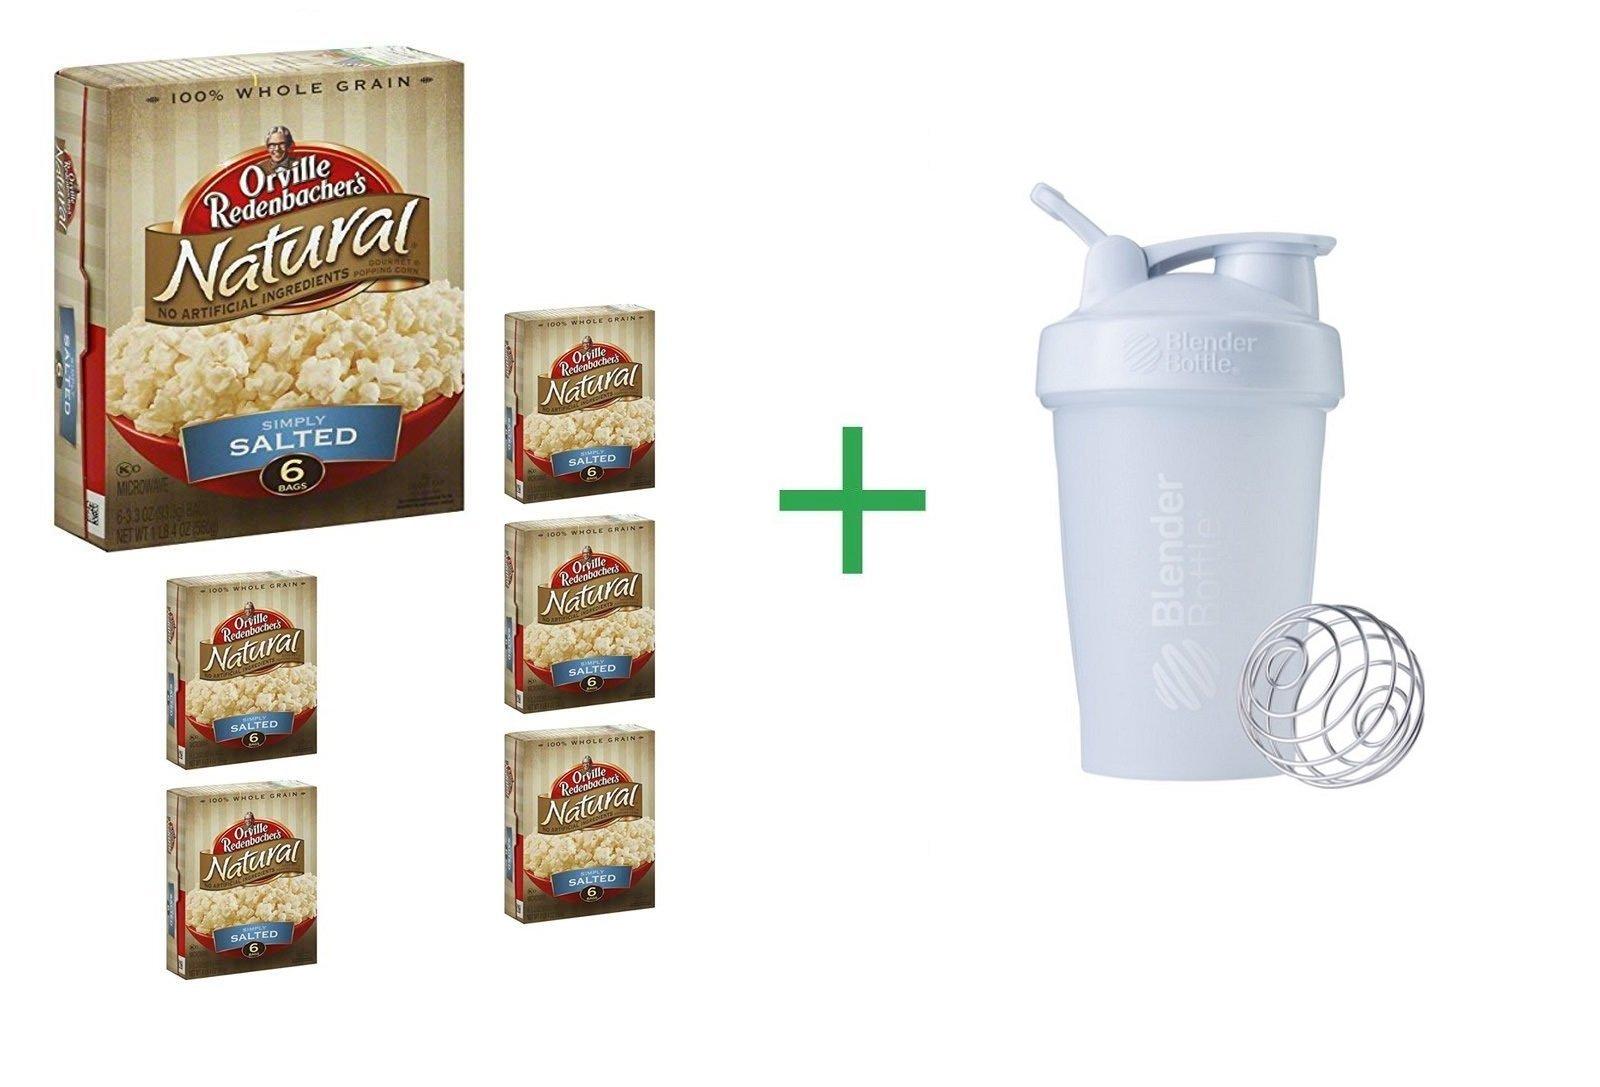 Orville Redenbacher's Natural Simply Salted Gourmet Popping Corn 6 CT (Pack of 6) + Blender Bottle